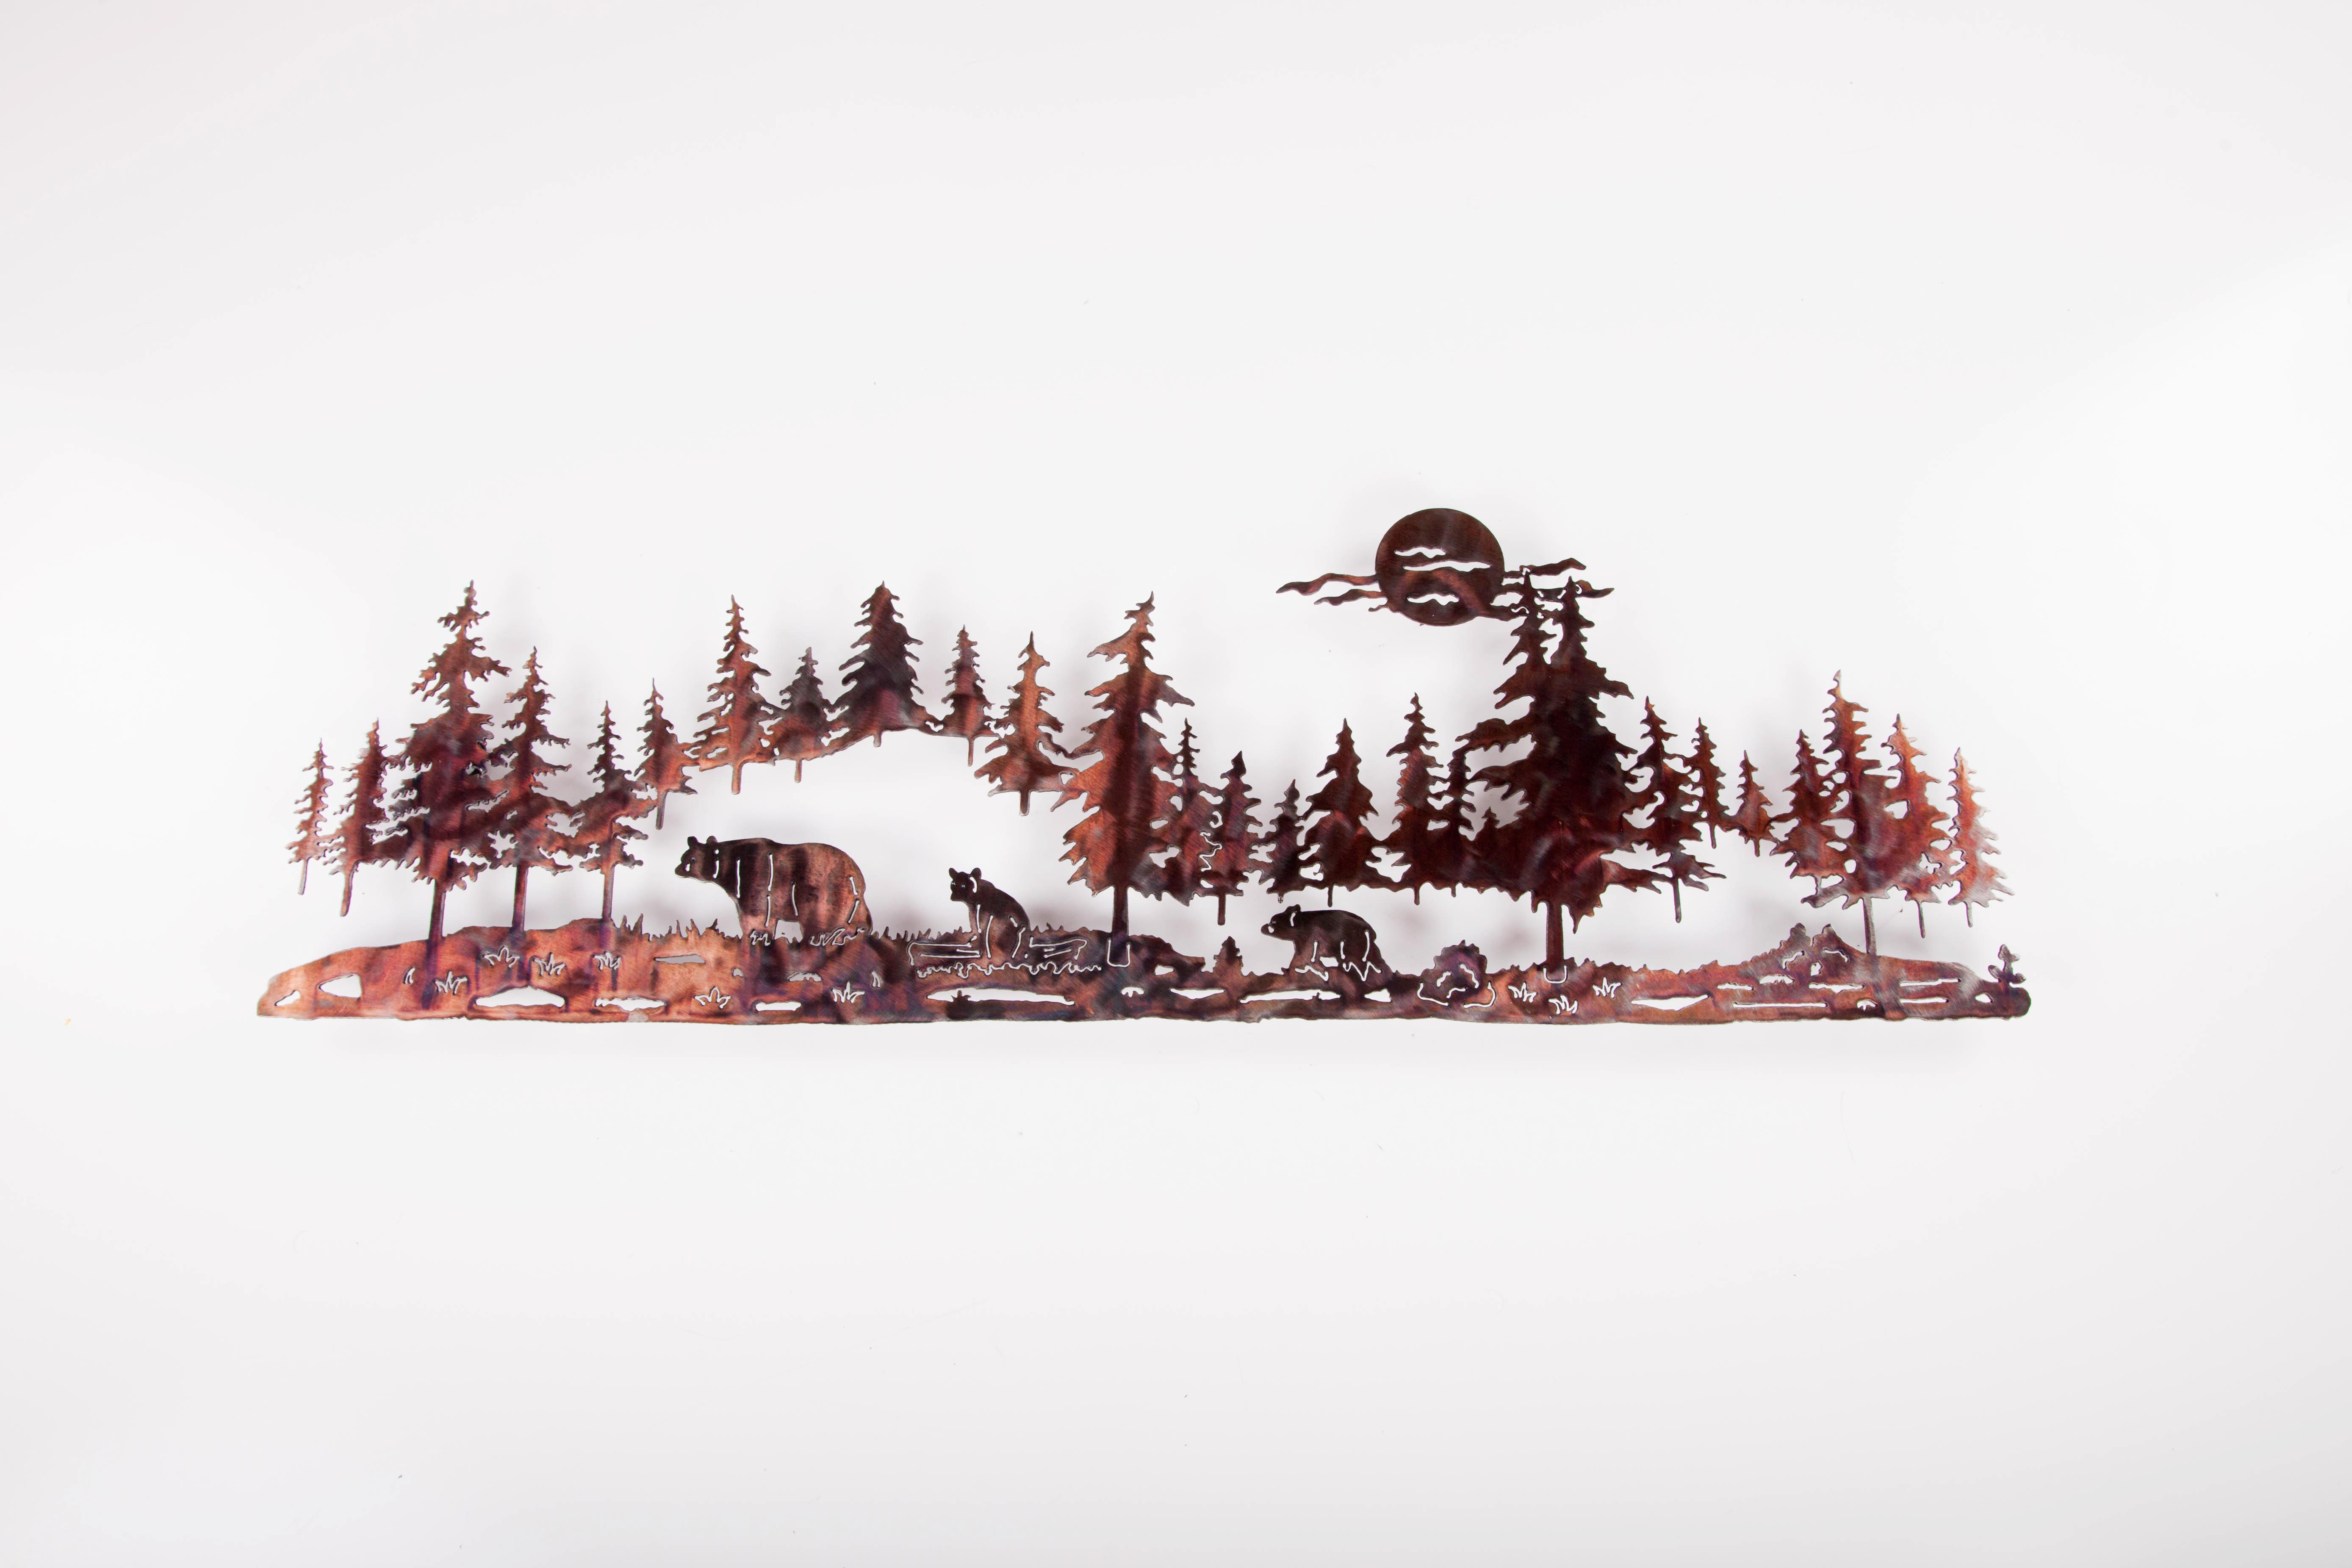 Pine line w/ Bear (P)